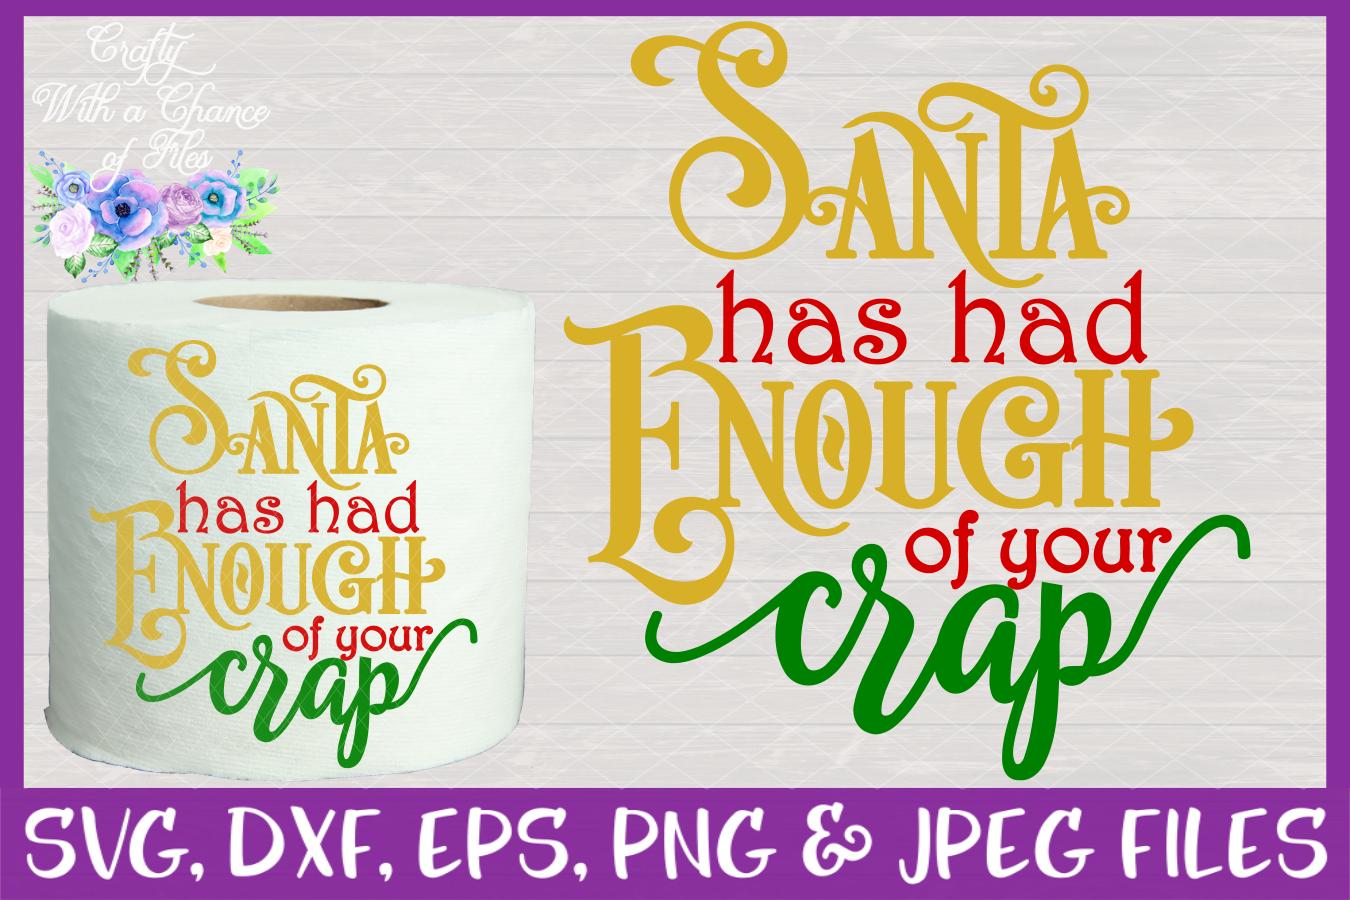 Christmas Toilet Paper SVG Bundle - Gag Gift Designs 2016 example image 3